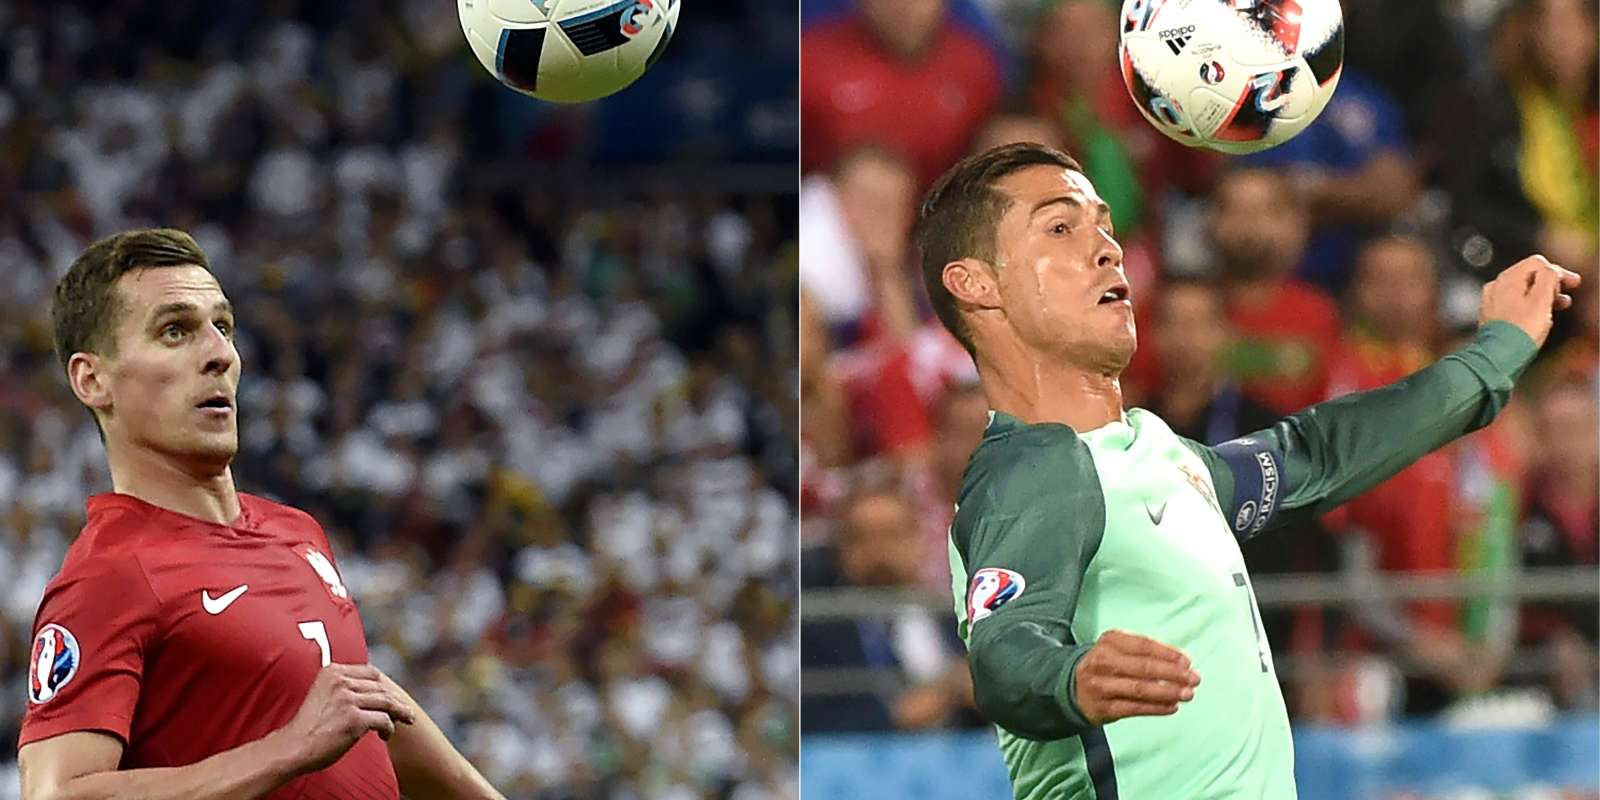 Arkadiusz Milik et Cristiano Ronaldo s'affrontent en quarts de finale jeudi soir.